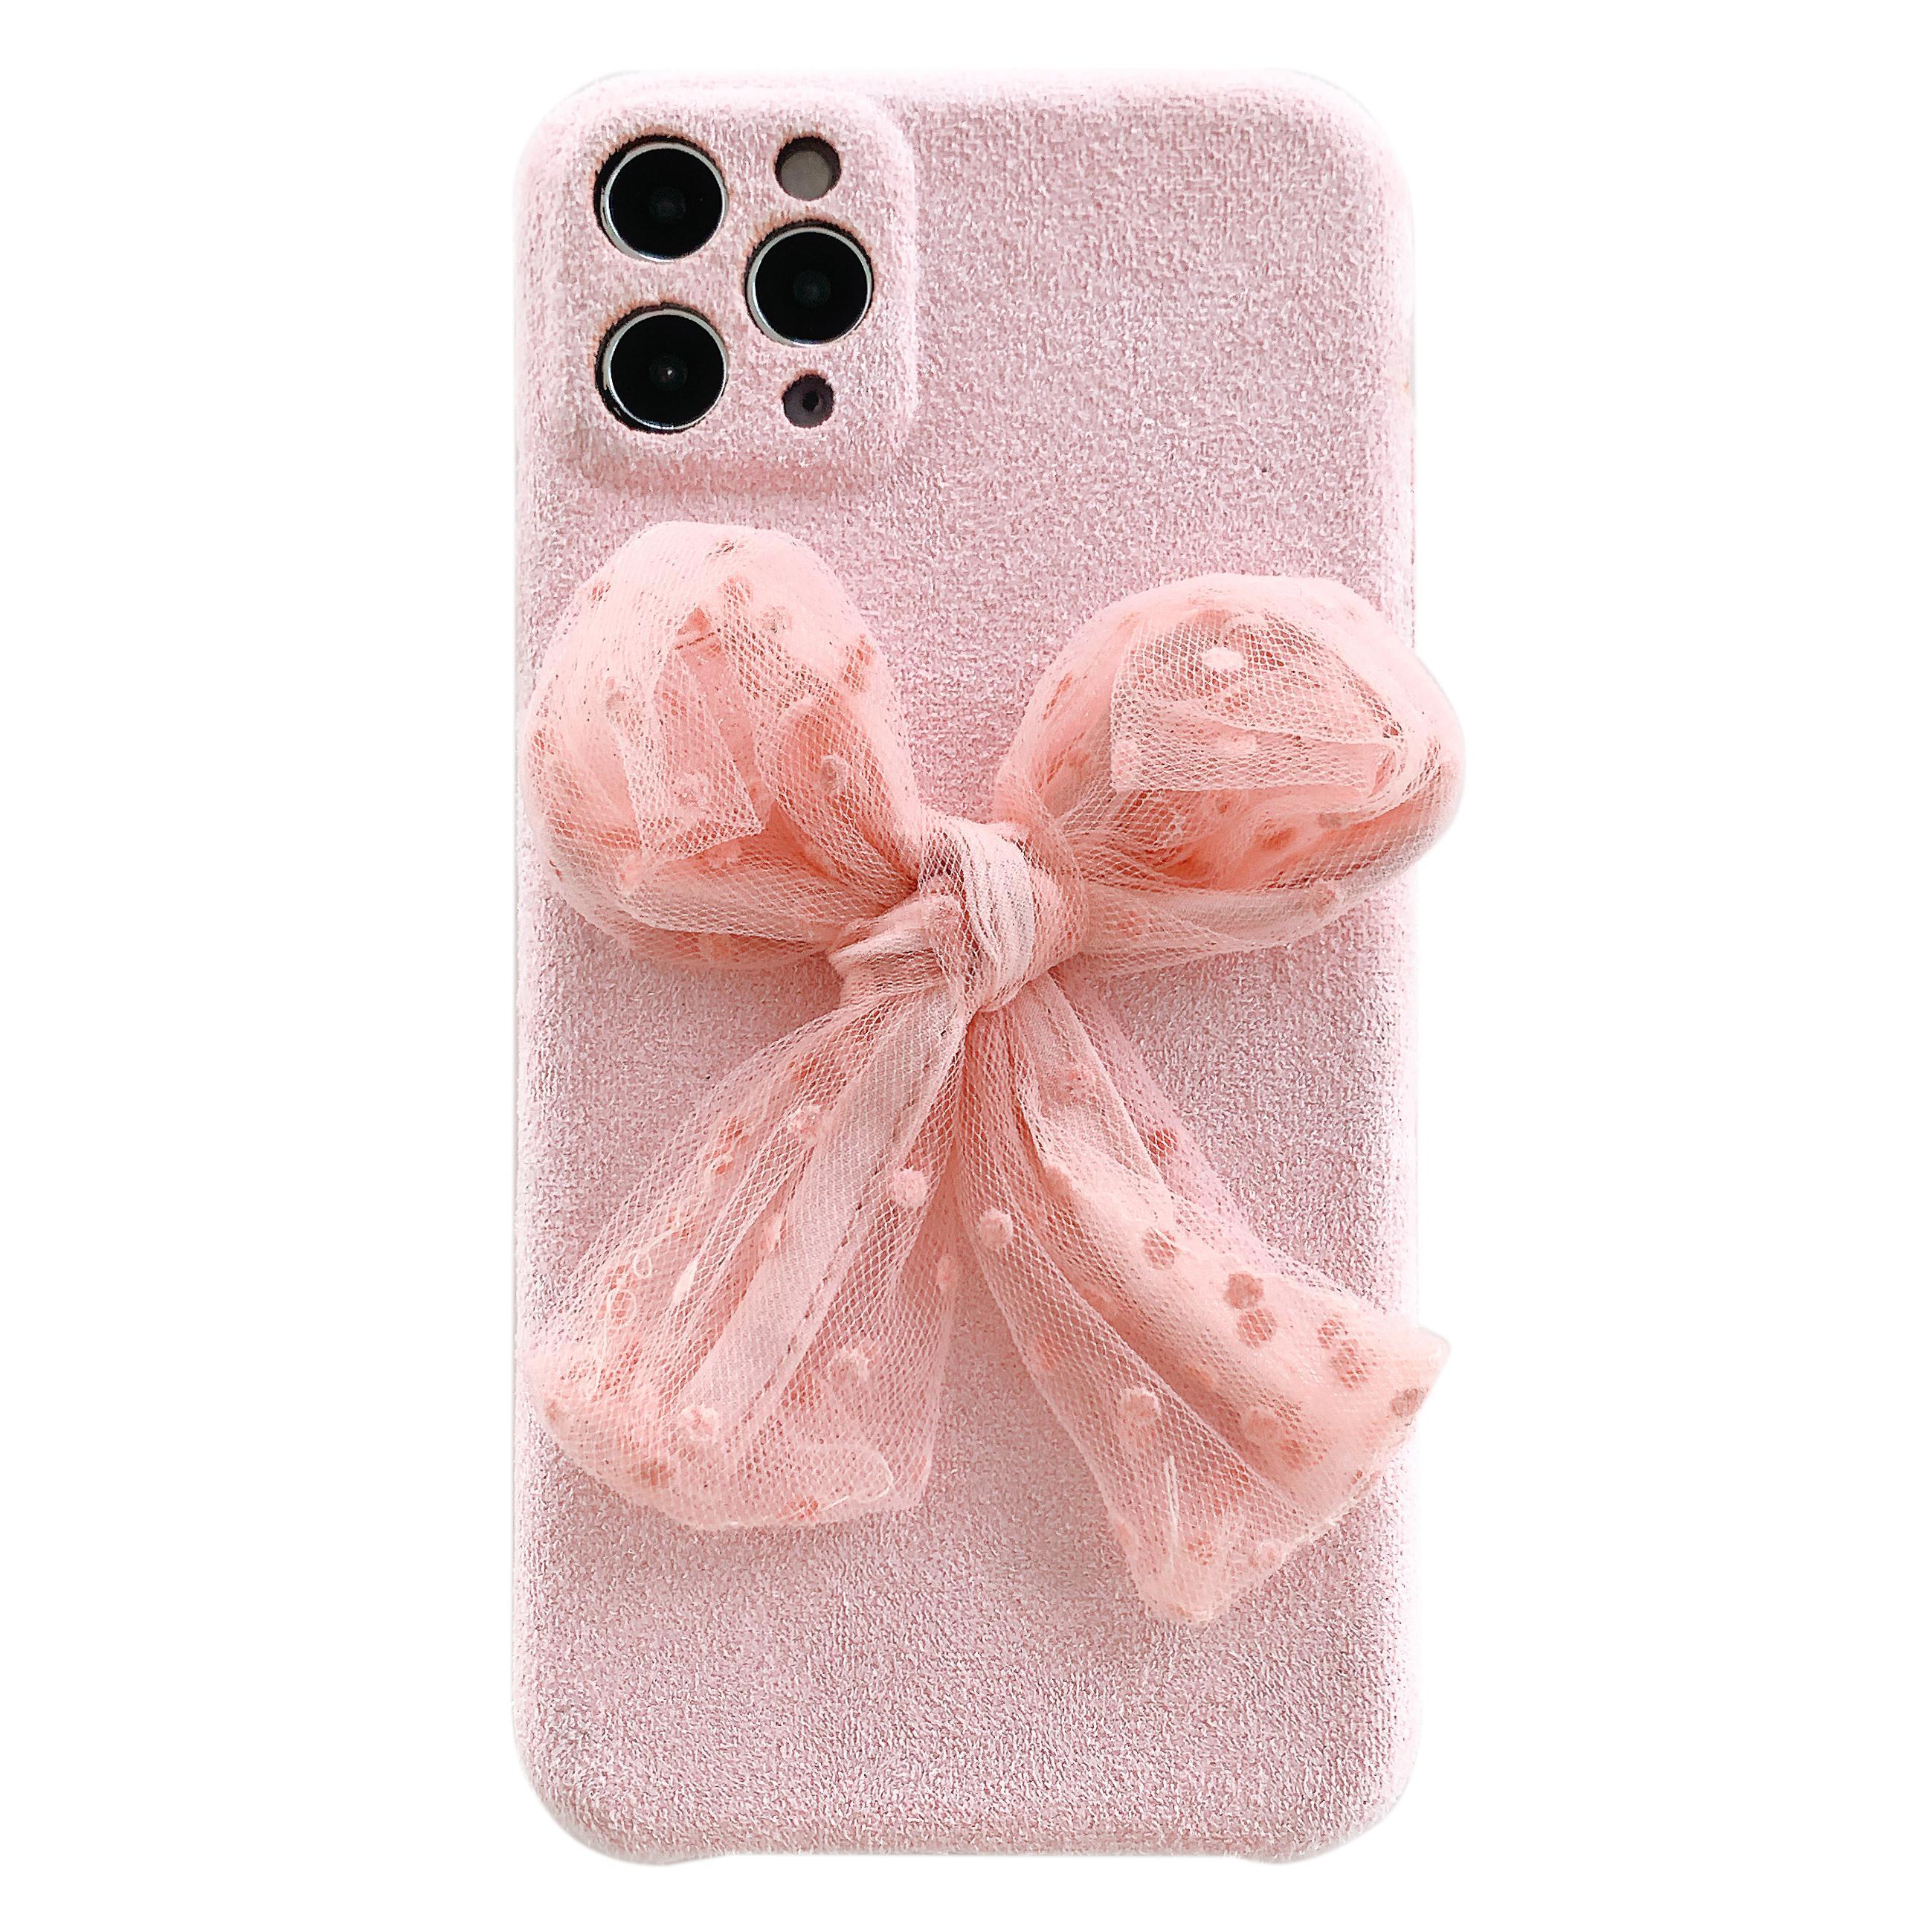 IPhone 11 Pro случай Bowknot волокна телефон случае для IPhone 11Pro / MAX / XS